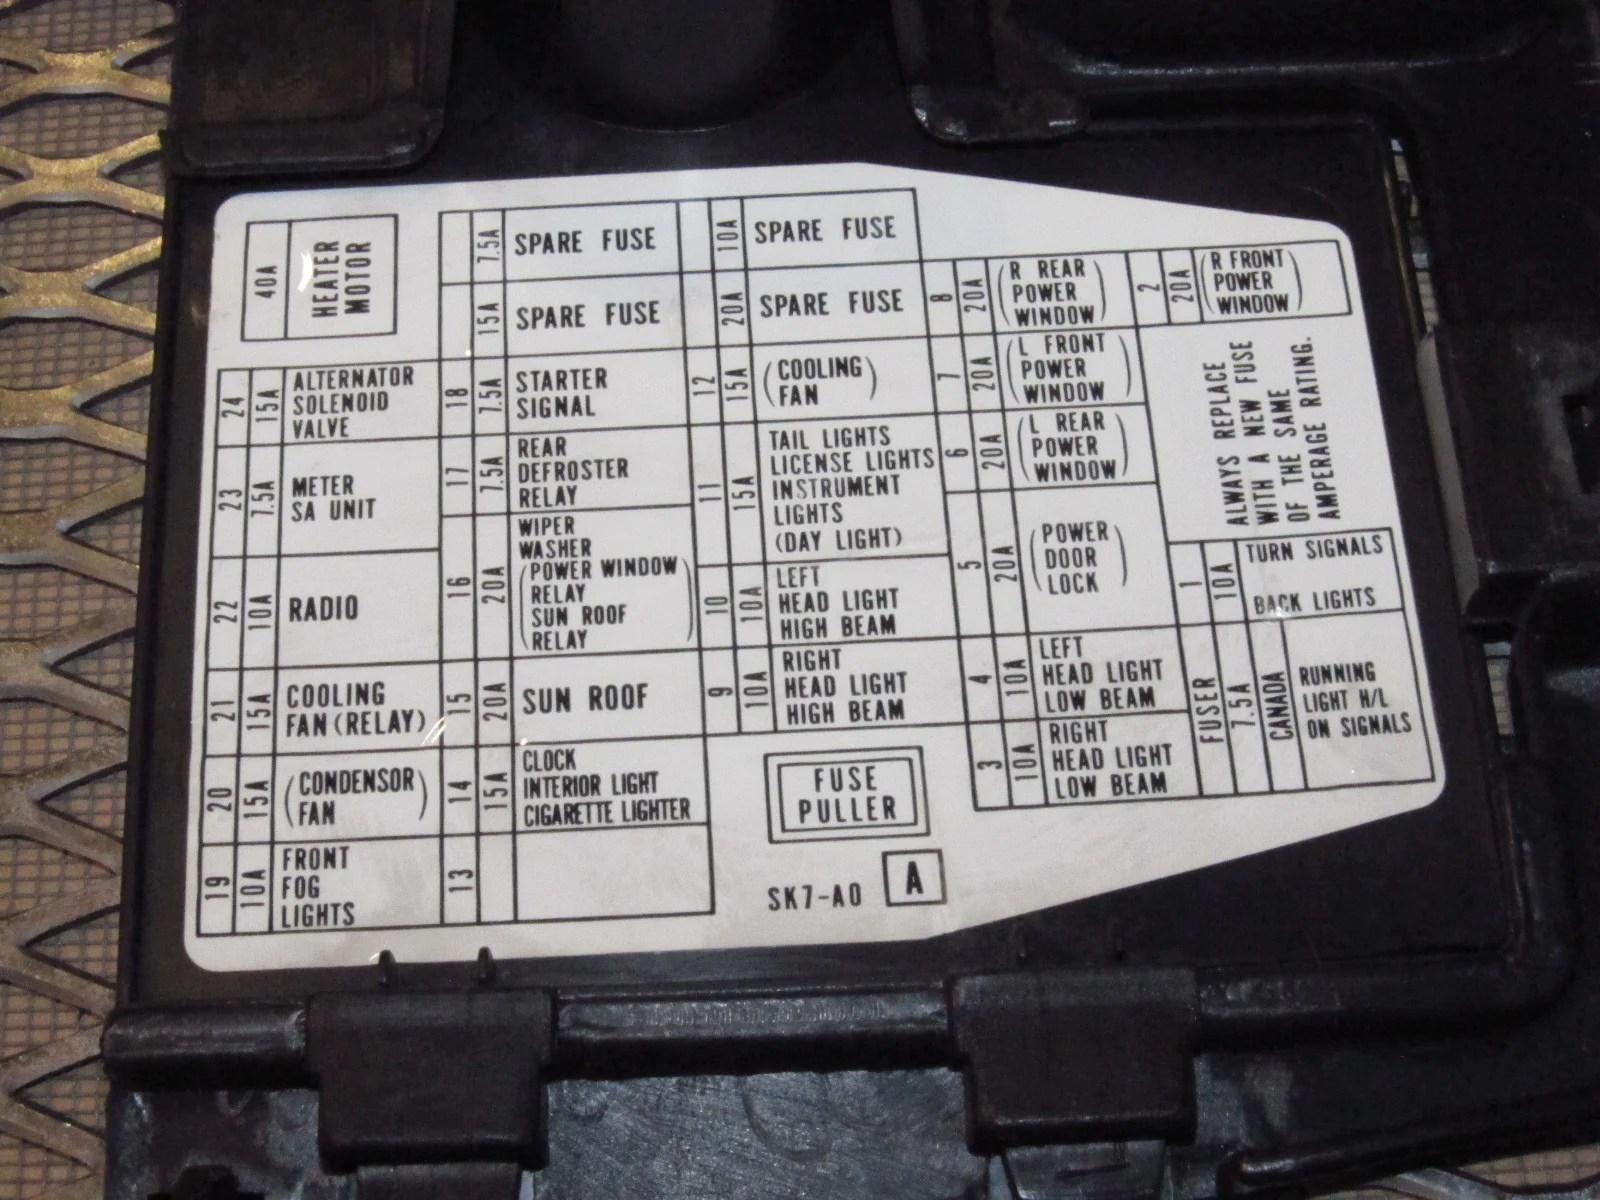 medium resolution of 93 acura legend fuse box diagram wiring diagrams img honda prelude fuse box 1990 acura fuse